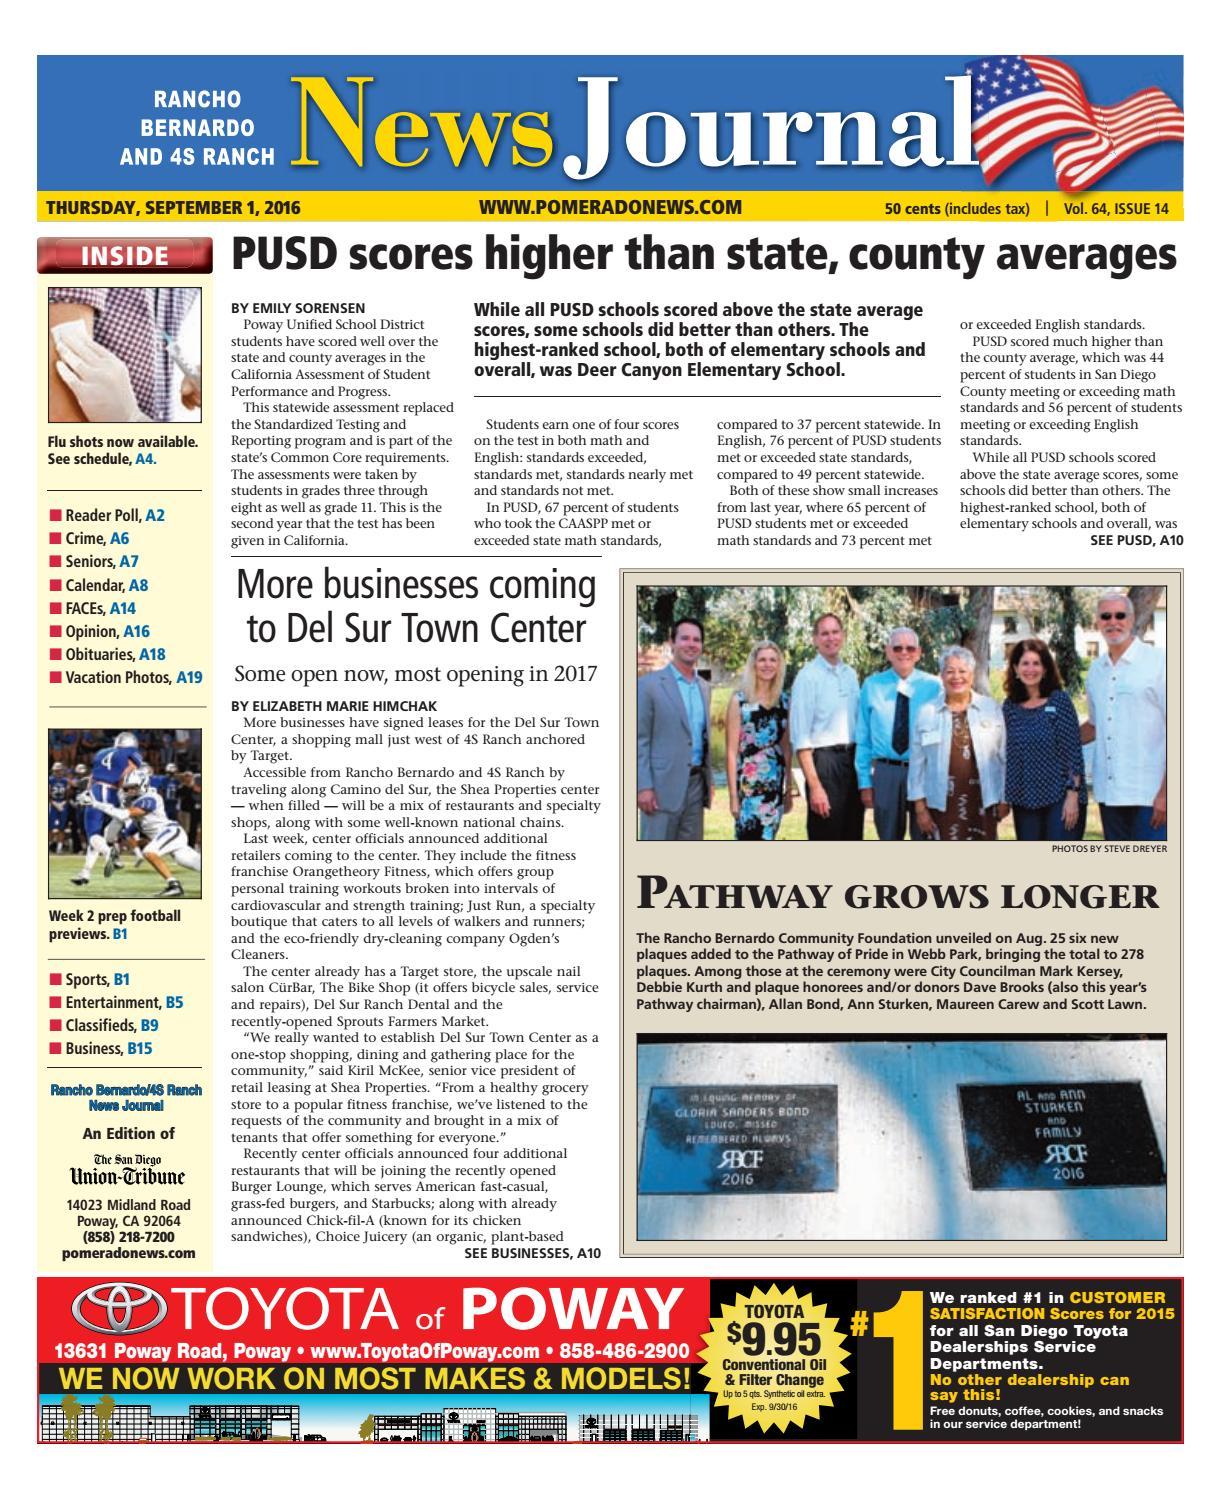 Rancho bernardo news journal 09 01 16 by MainStreet Media